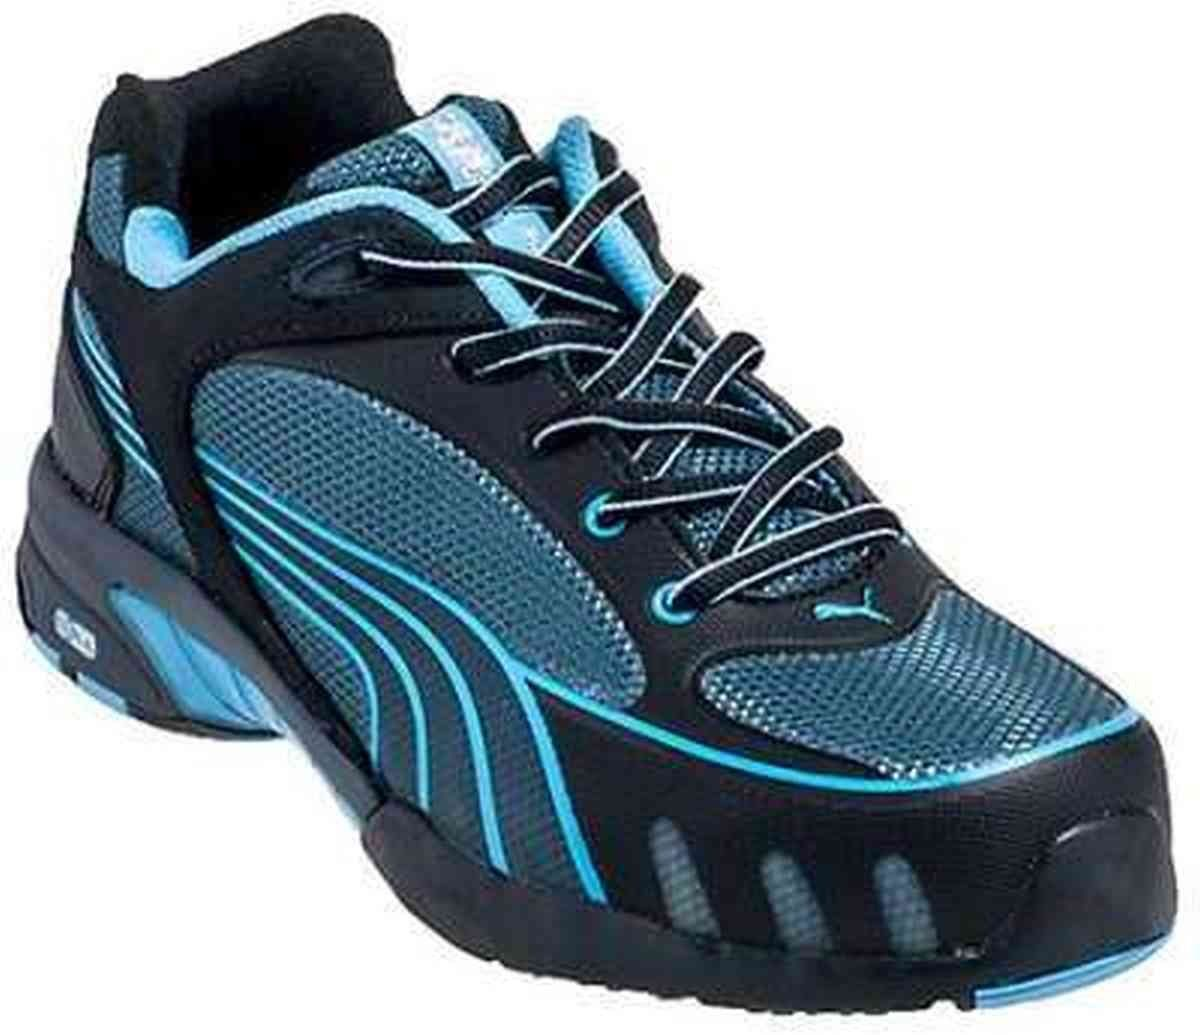 bd86d077d8a99a Women s Puma Safety Fuse Motion SD Low Steel Toe Shoes